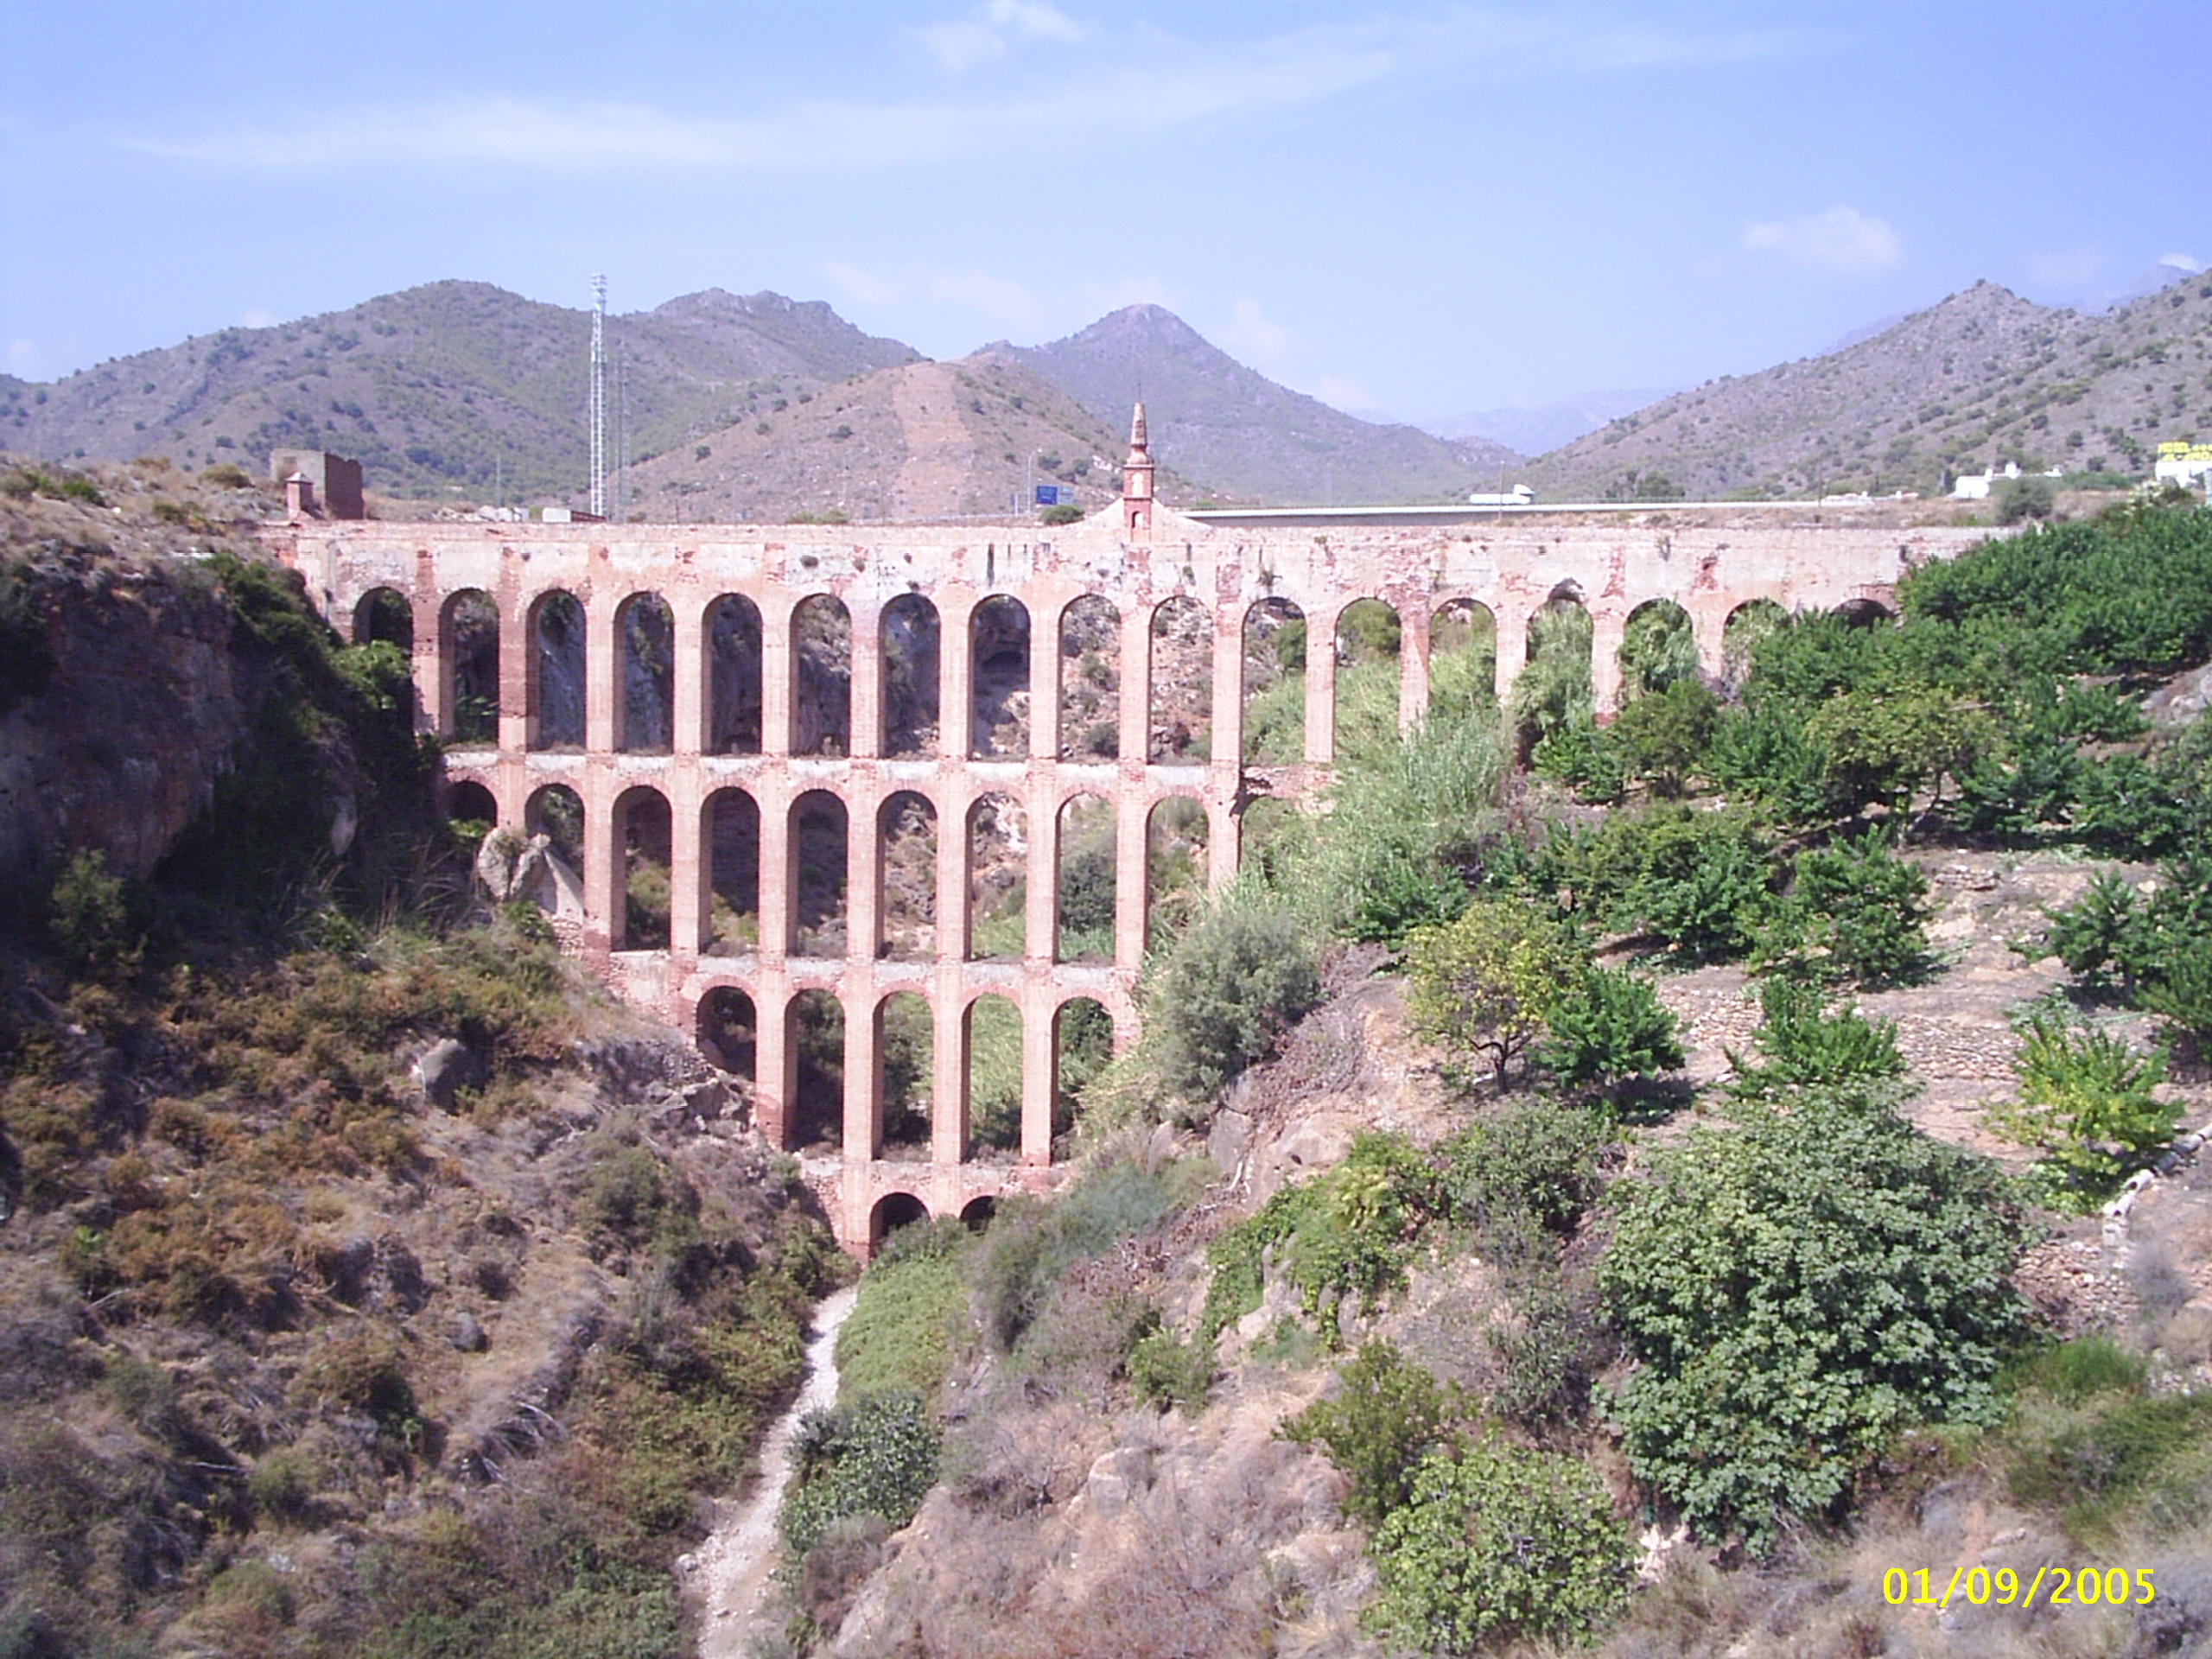 File:Acueducto del Aguila.jpg